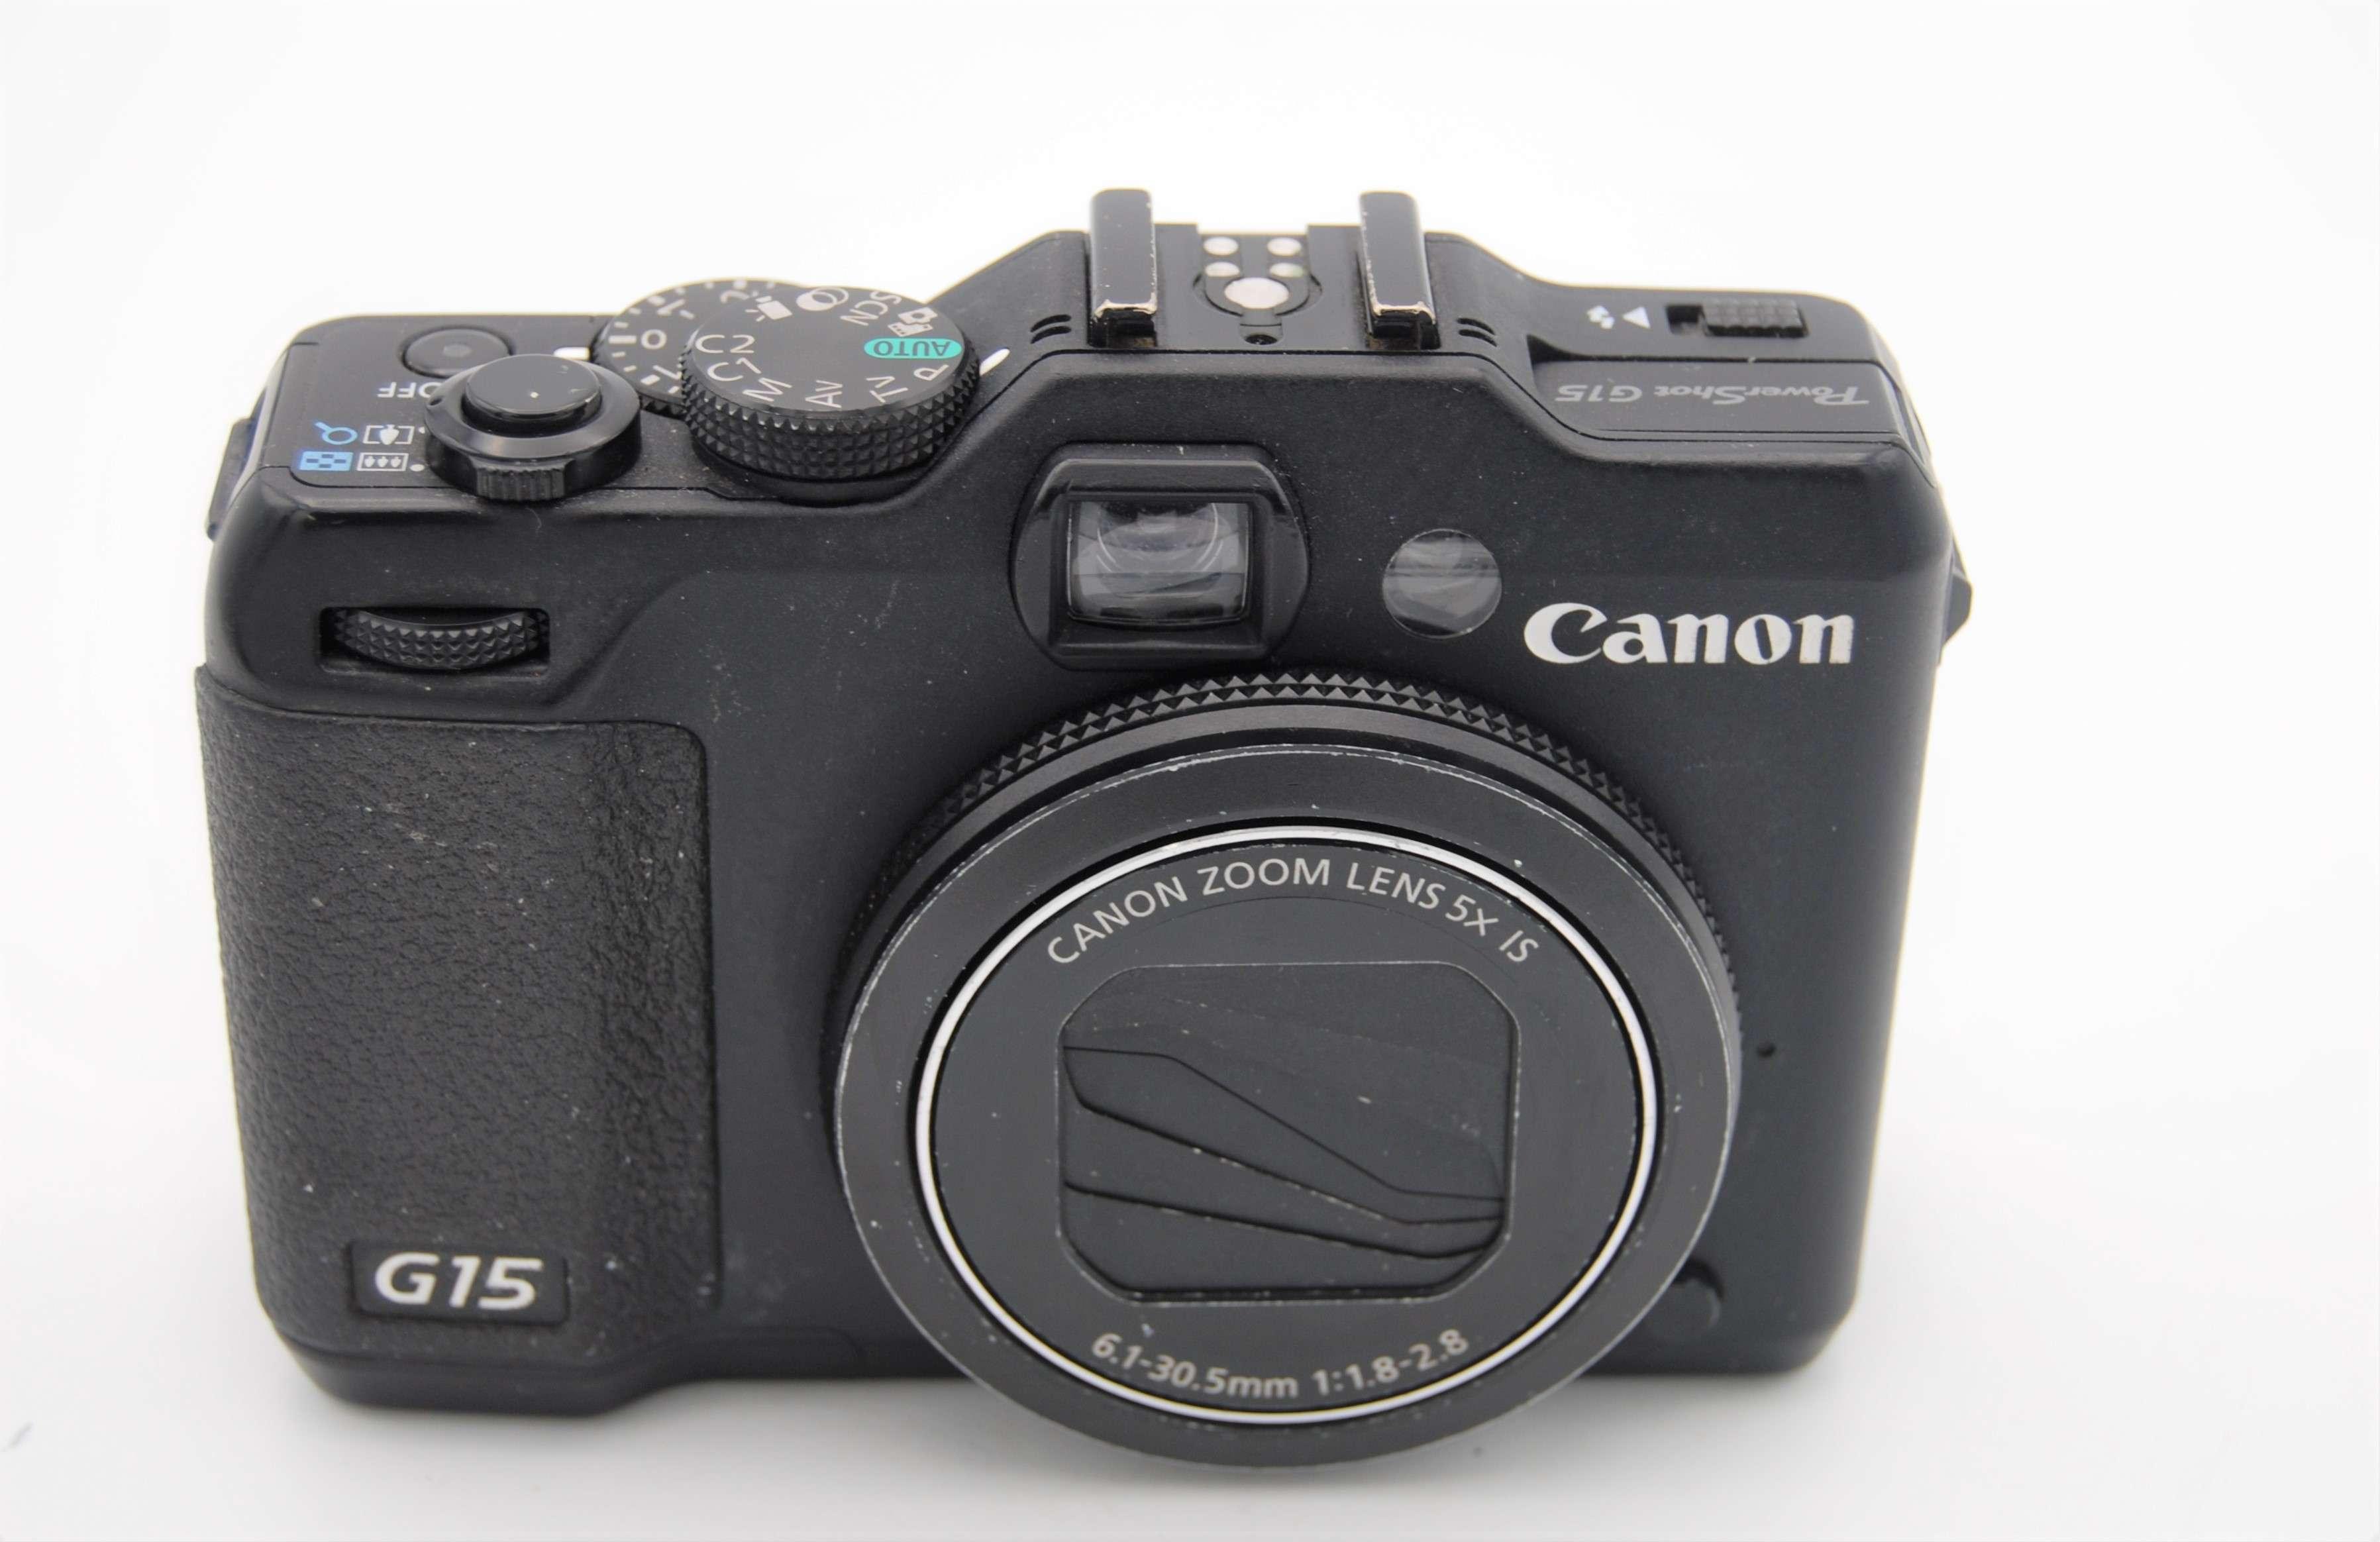 canon powershot g15 12 1mp digital camera black 13803156805 ebay. Black Bedroom Furniture Sets. Home Design Ideas